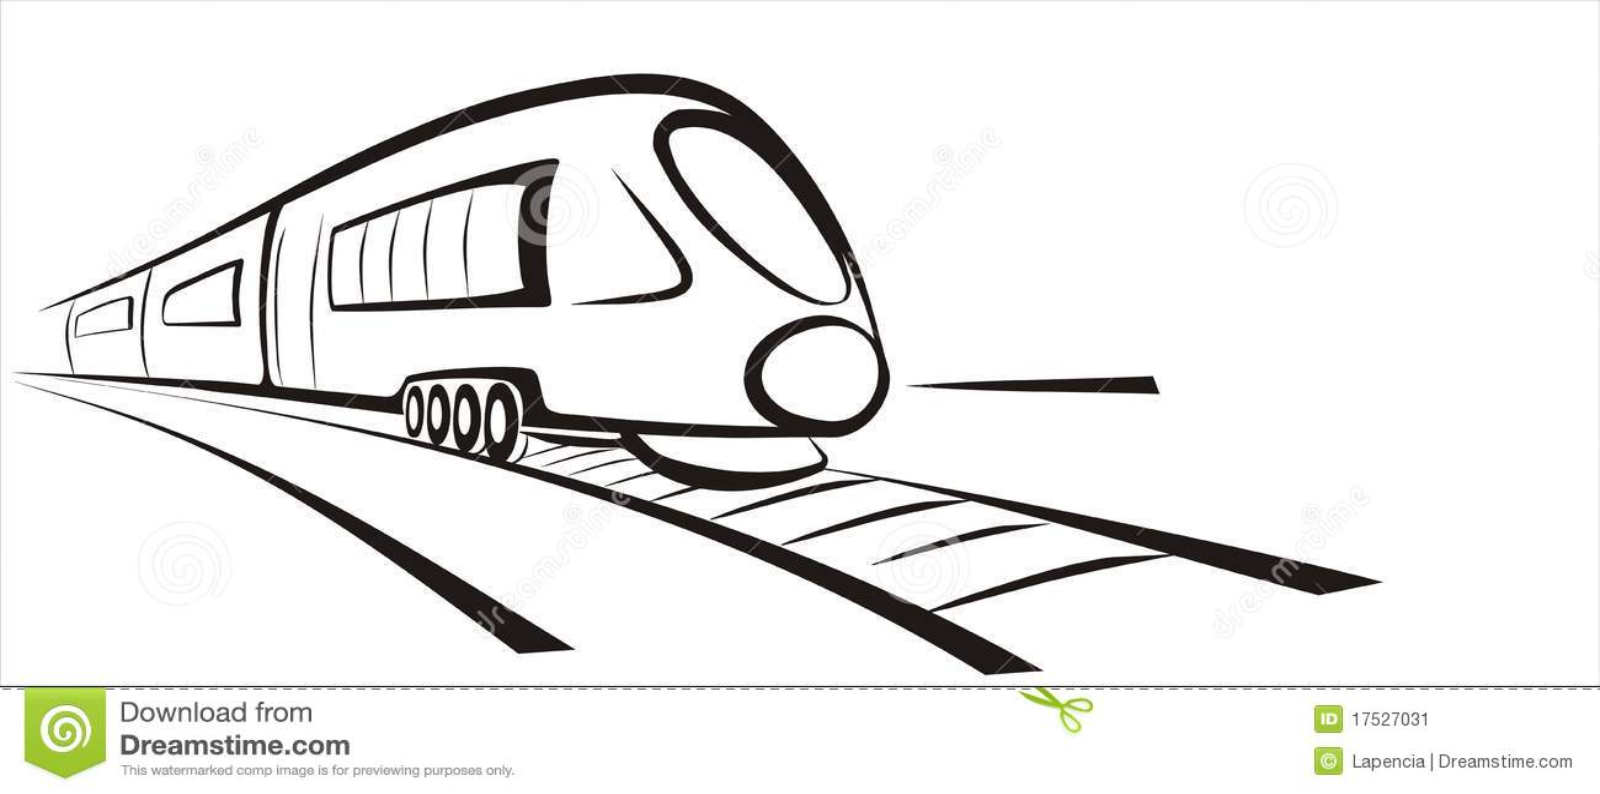 Rapid Train Sketch Stock Illustrations